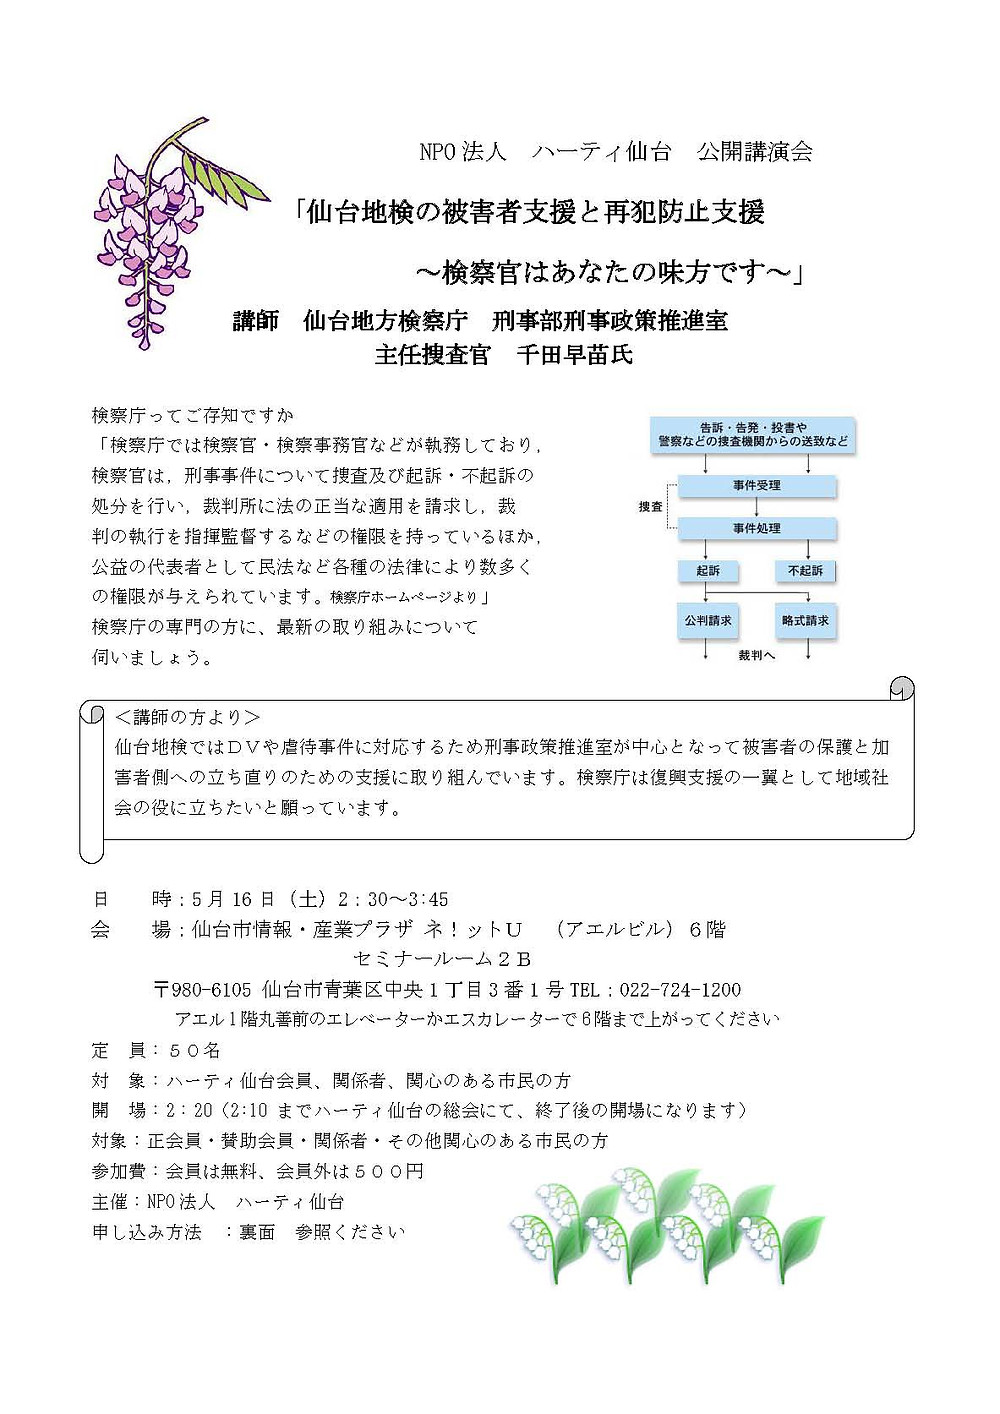 27?????????  公開講演会 _ページ_1.jpg